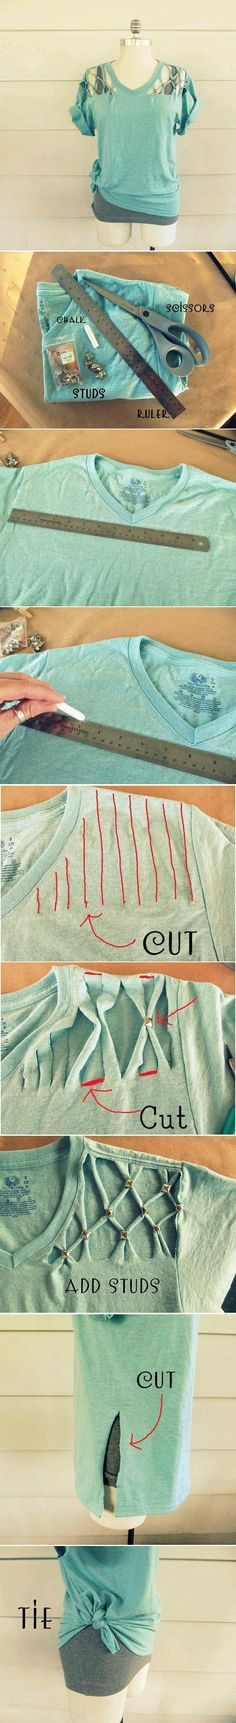 DIY Cool Studded T-Shirt